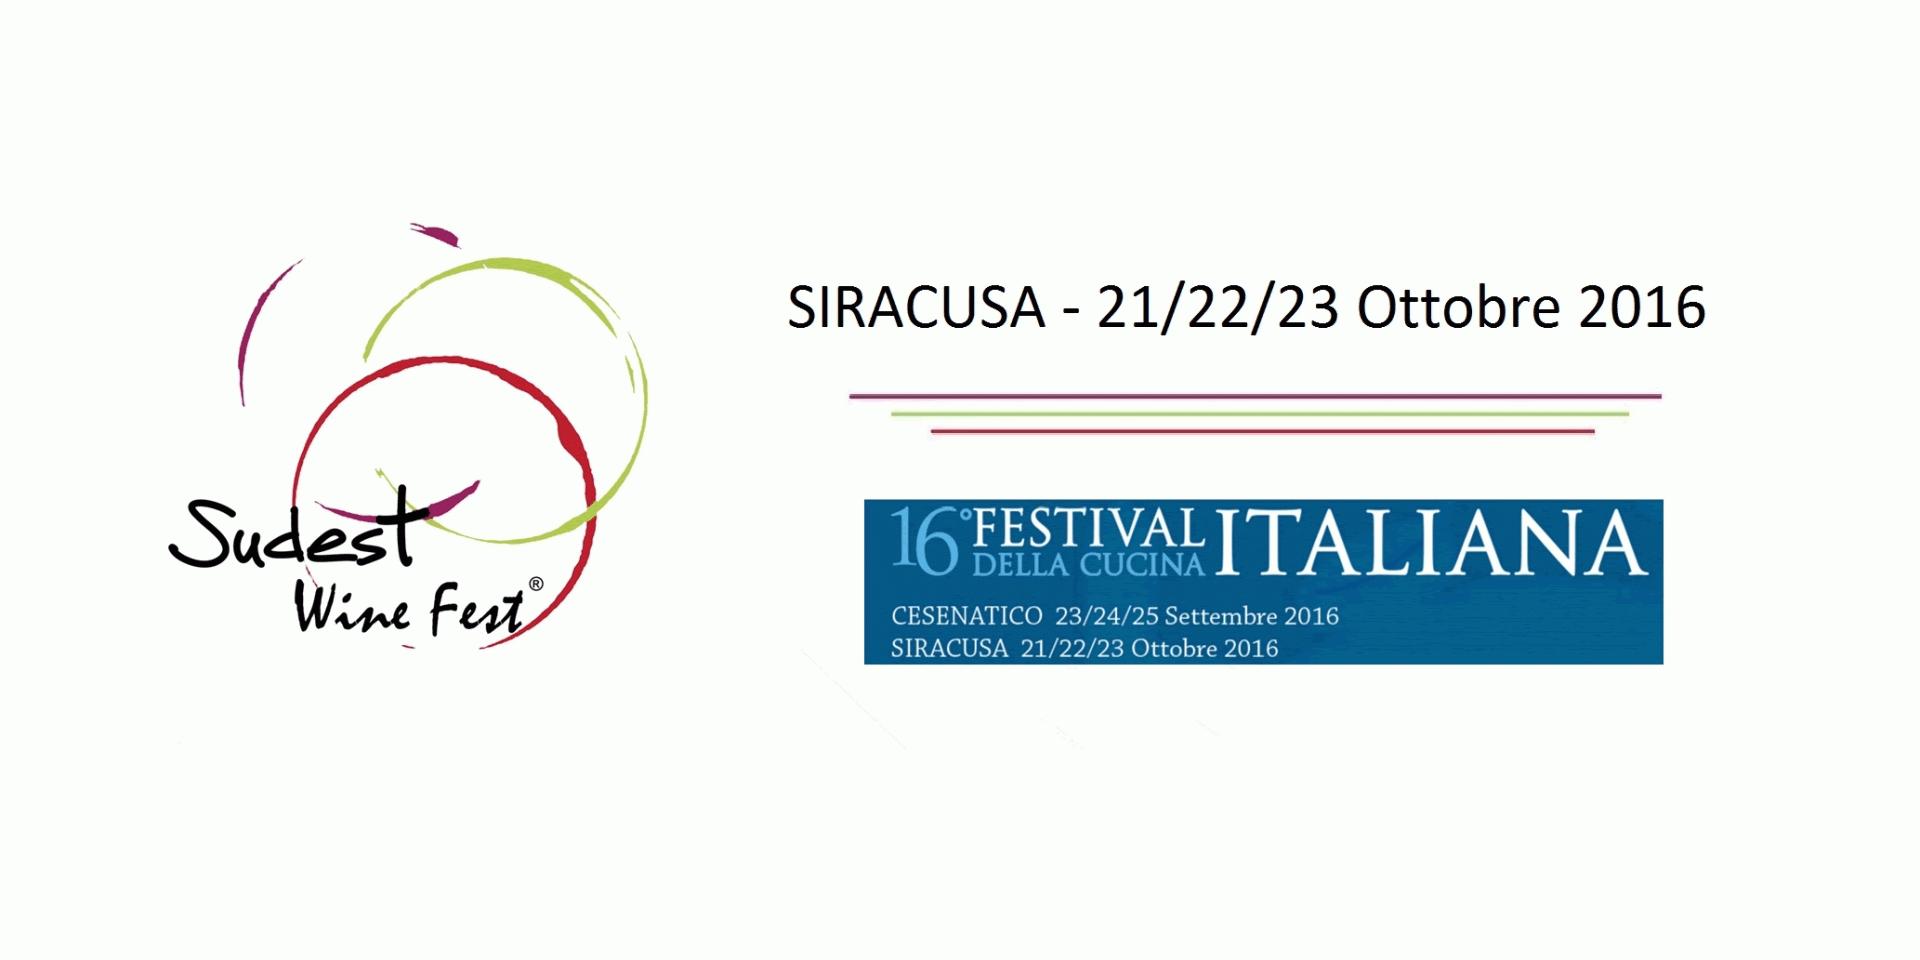 SUDEST WINE FEST – SIRACUSA ORTIGIA